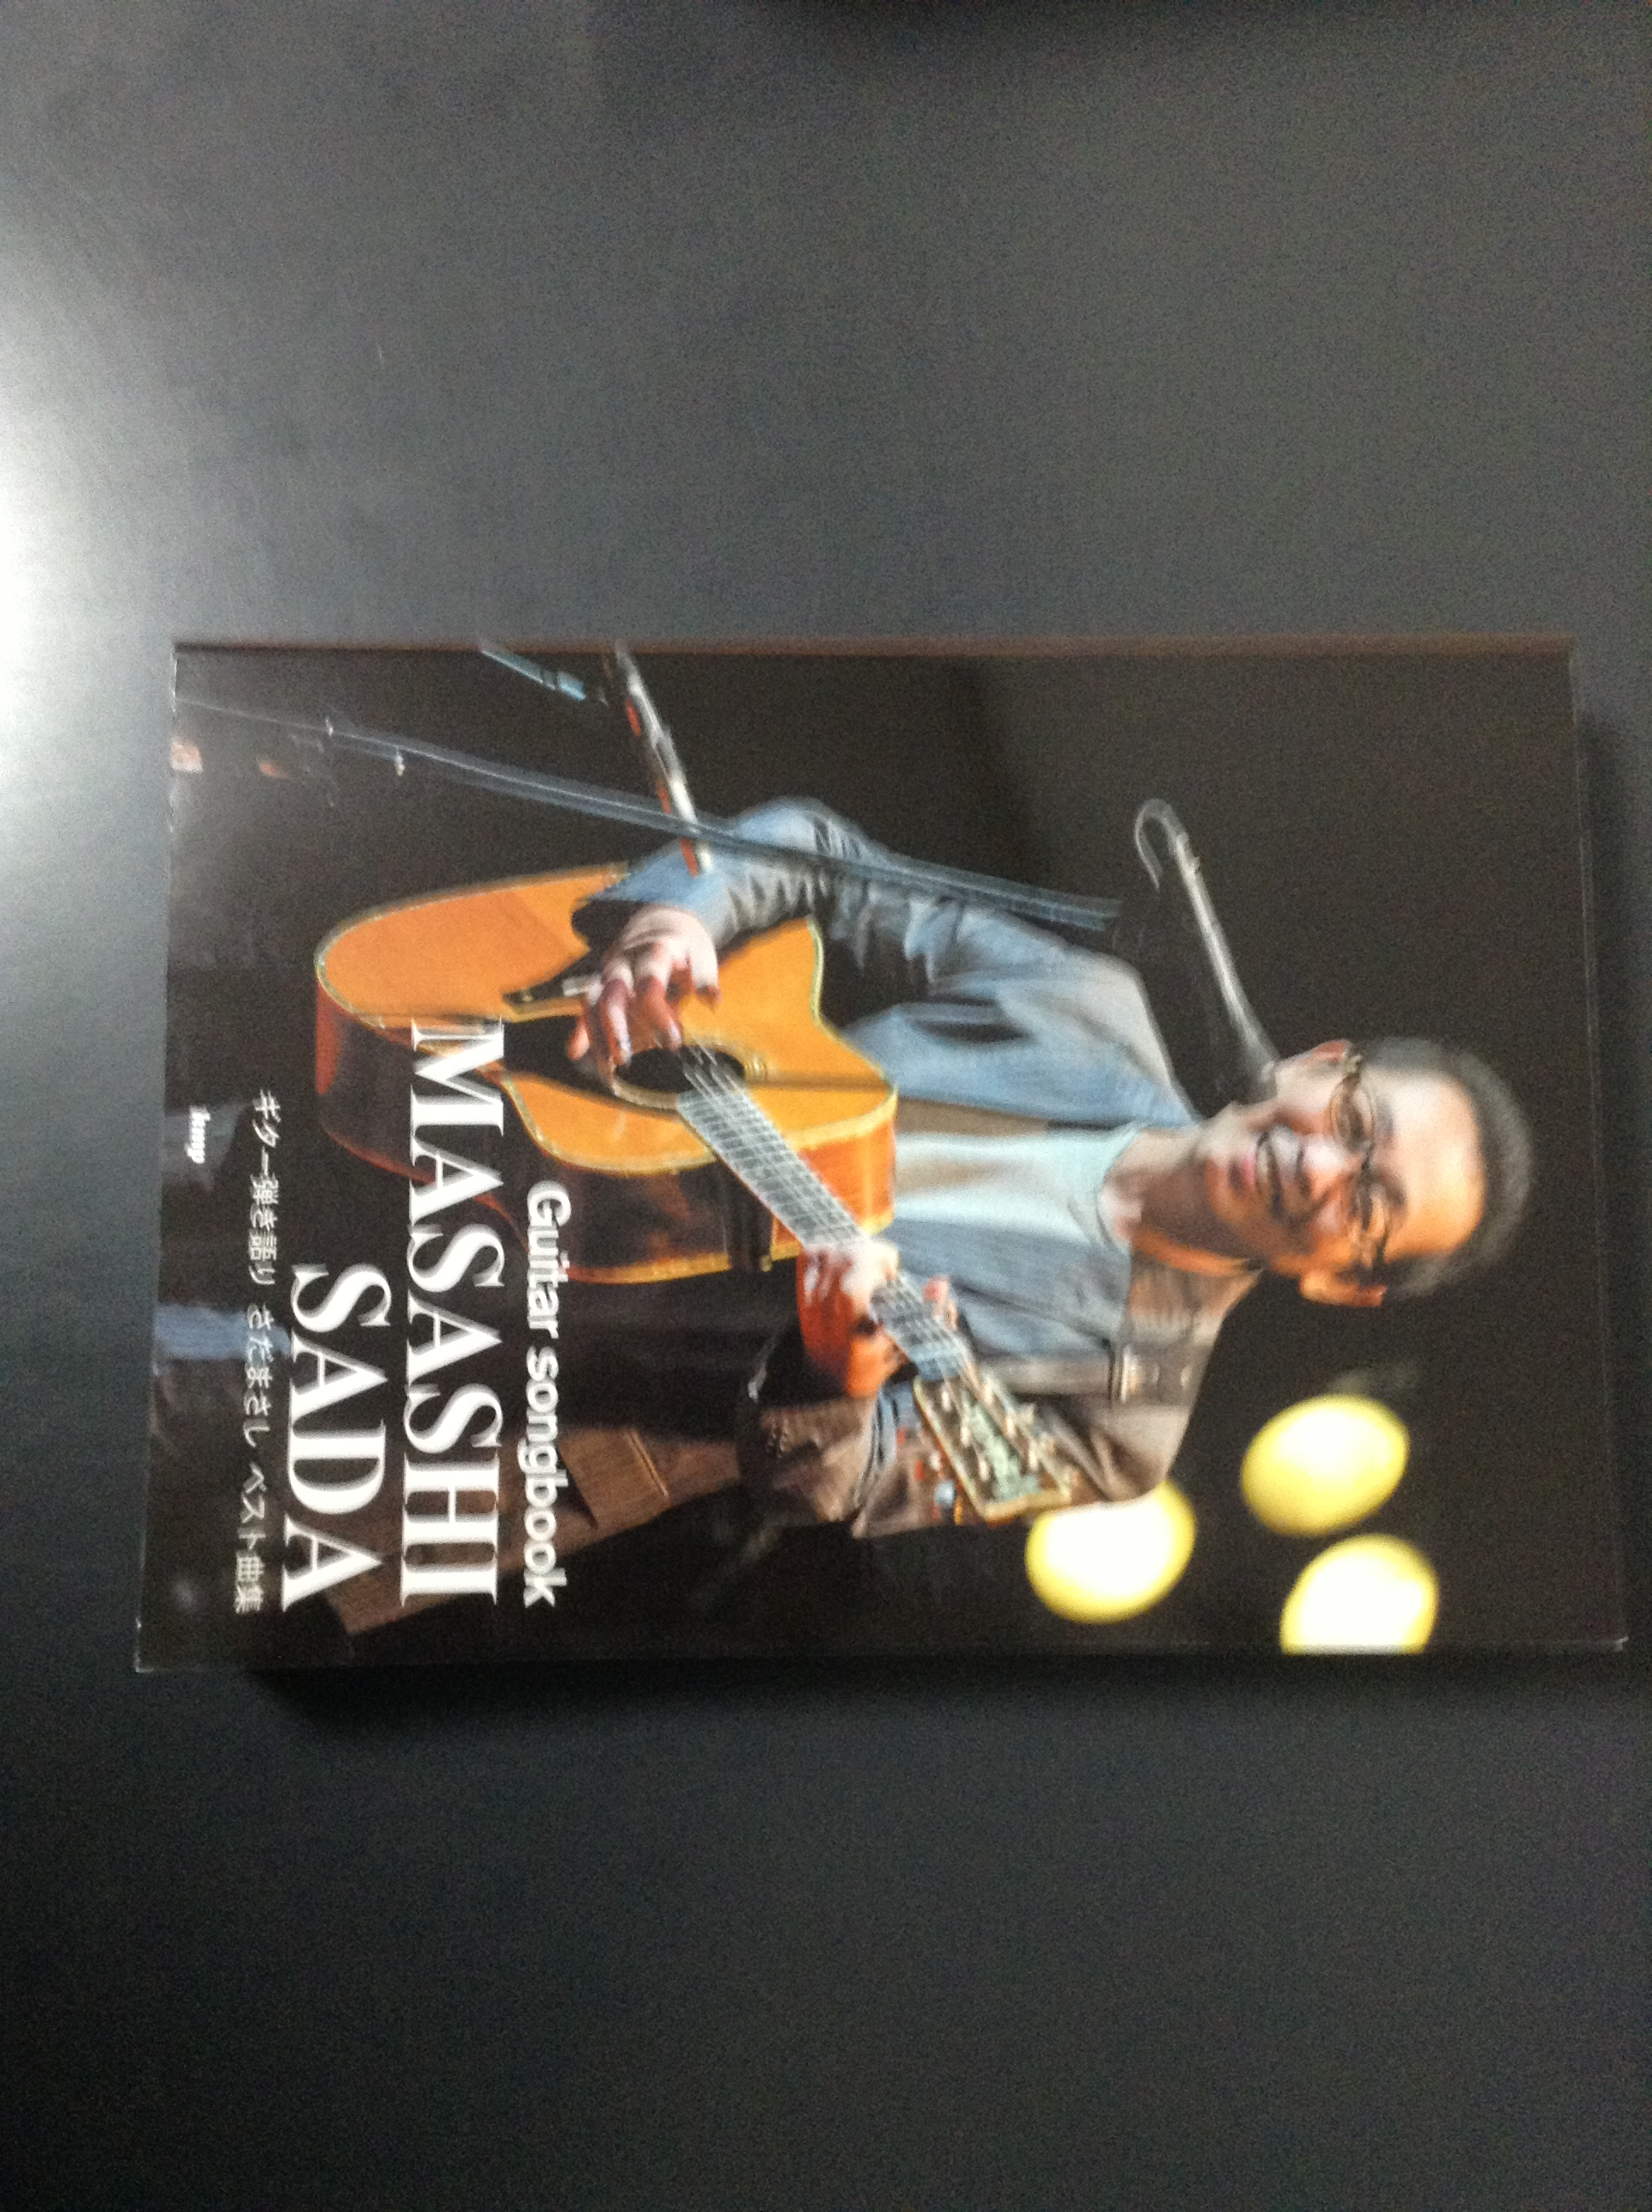 Guitar songbook さだまさし ベスト曲集 (ギター弾き語り)